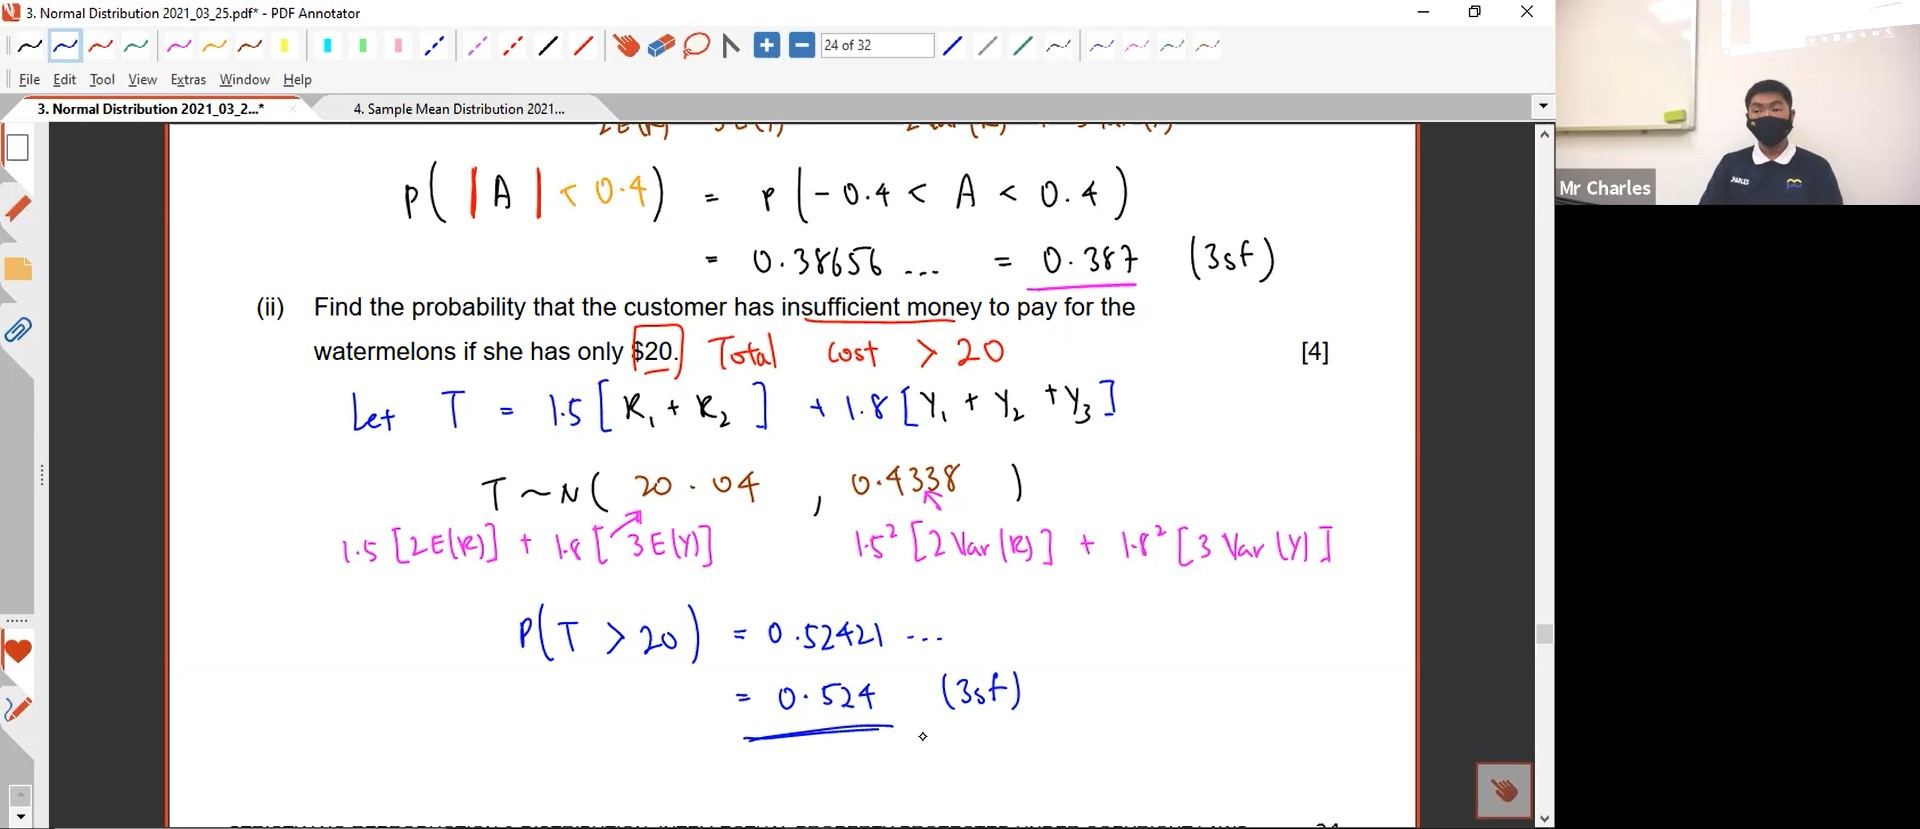 22. Normal Distribution L2 & Sample Mean Distribution L1